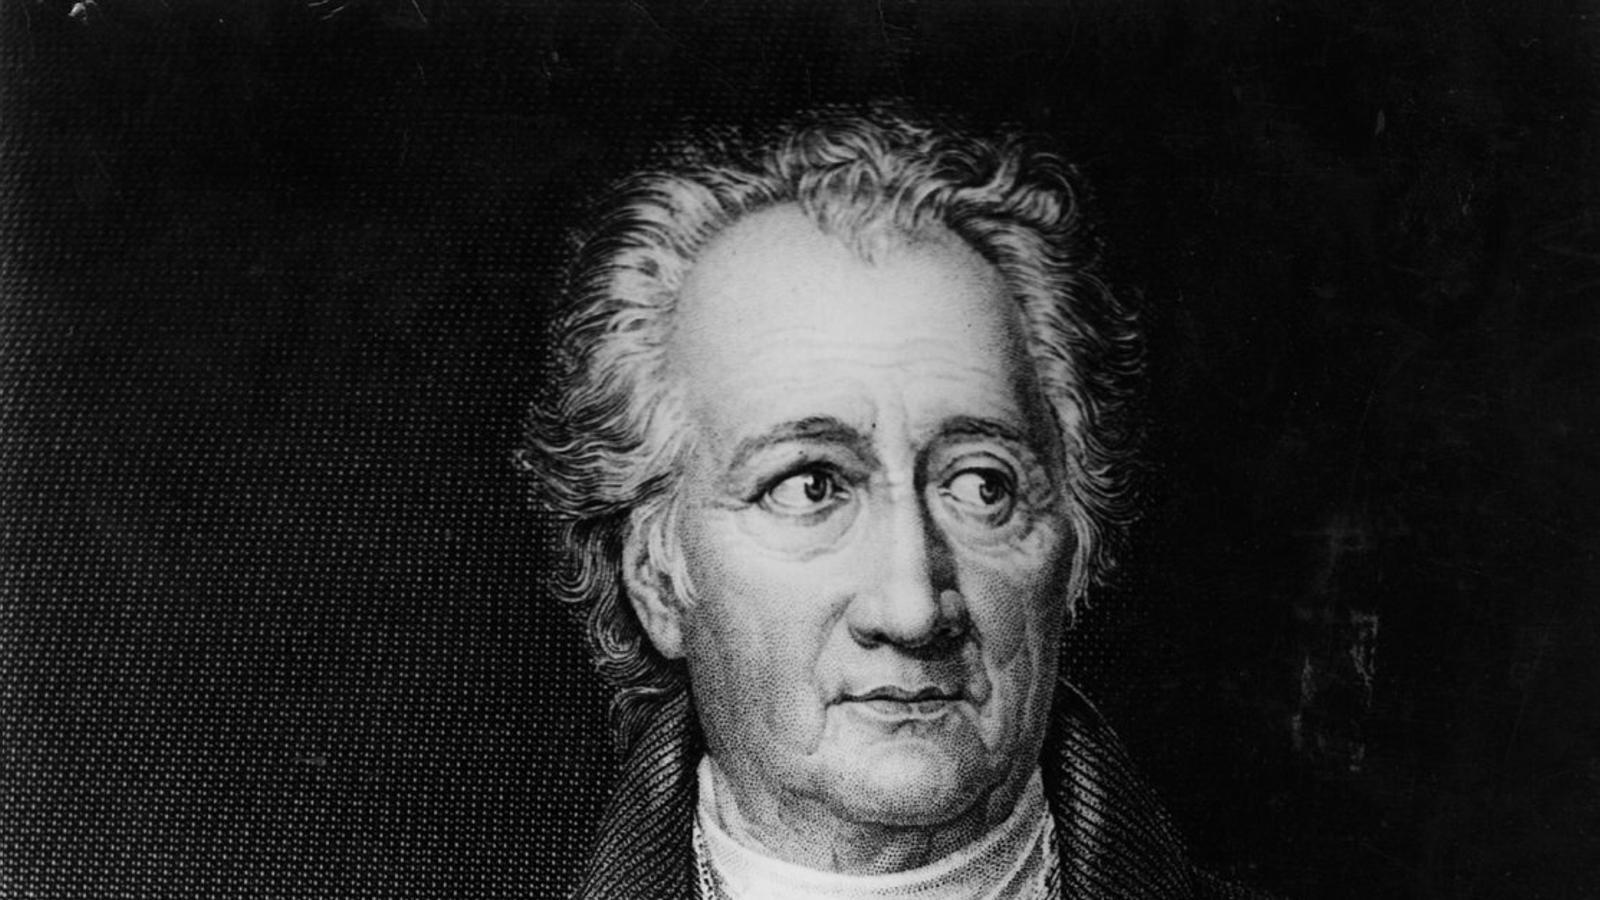 Goethe contra el sinistre duc d'Alba